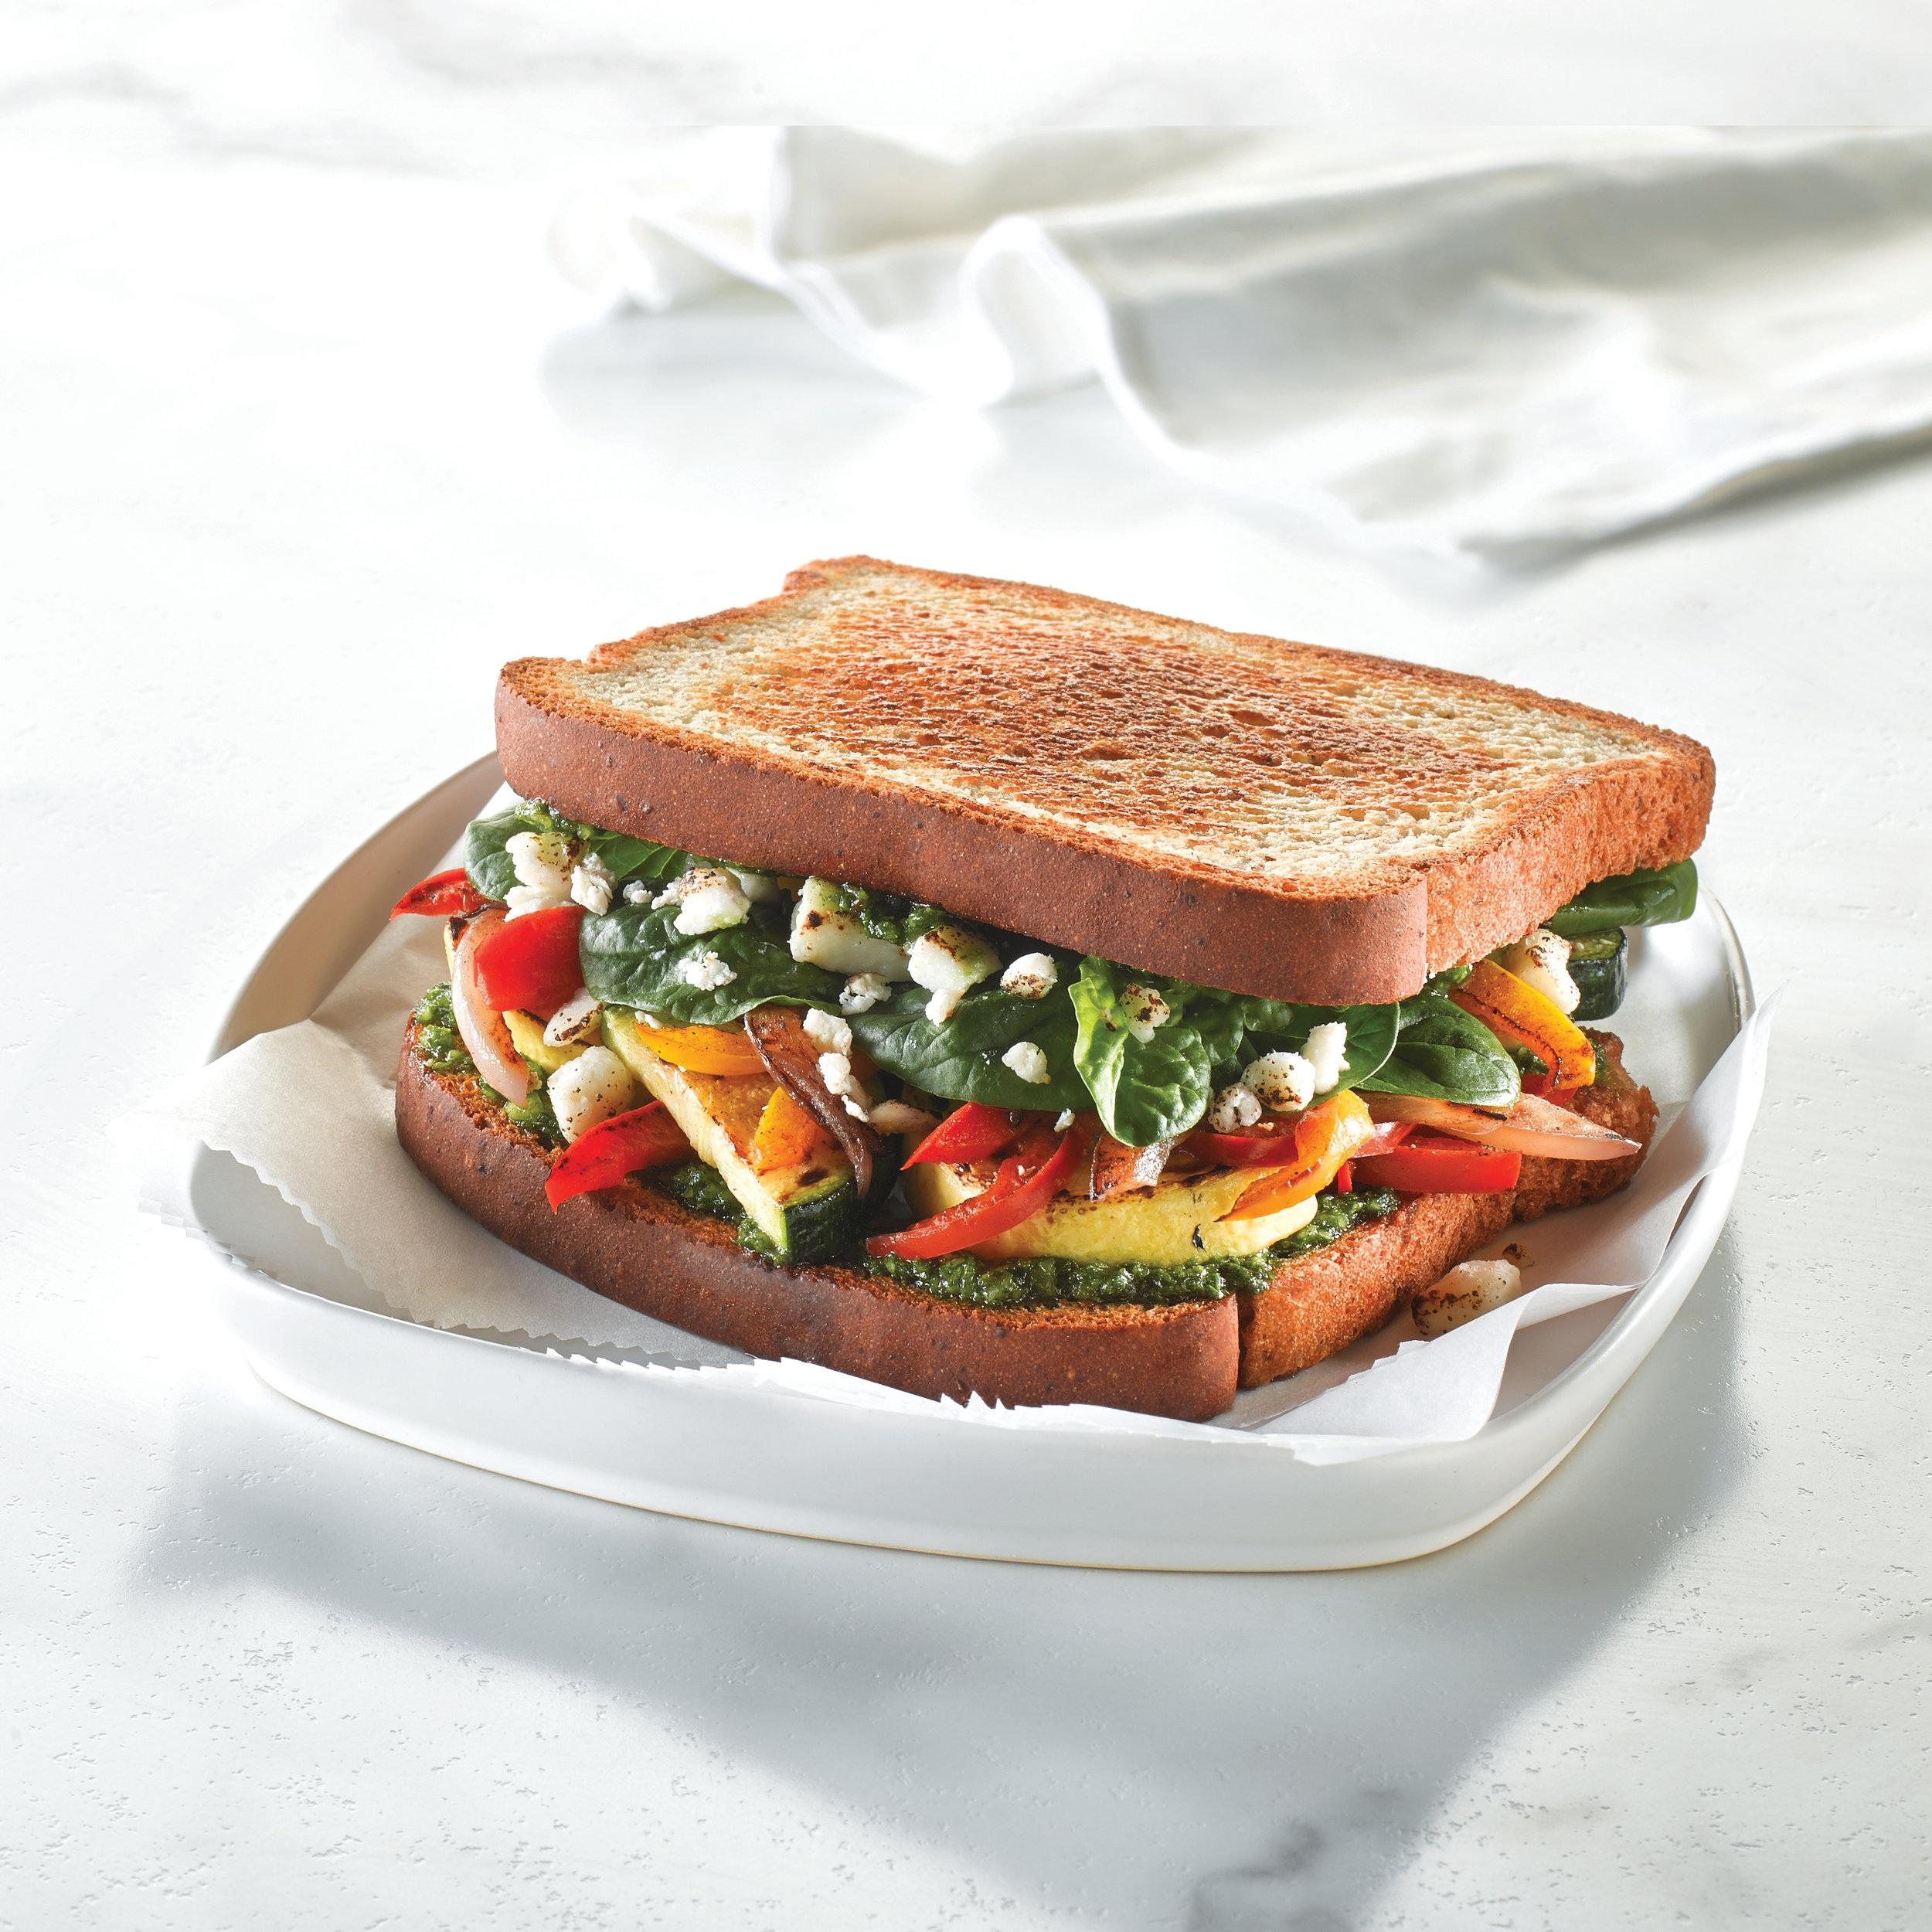 SpringSeasonal-Sandwich-RoastedVeg-squarergb.jpg